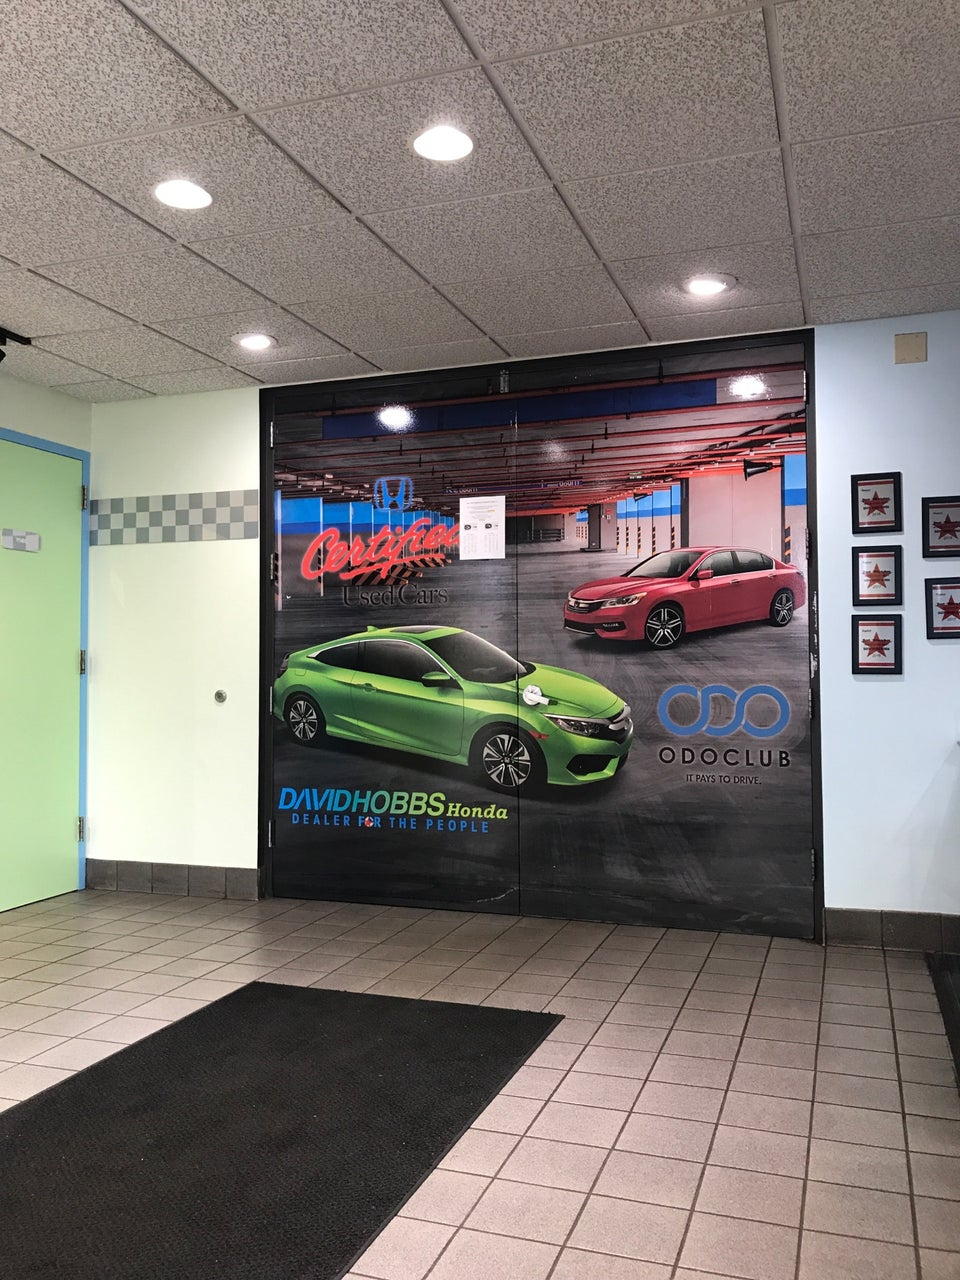 David Hobbs Honda Service & Parts 6100 N Green Bay Ave, Glendale